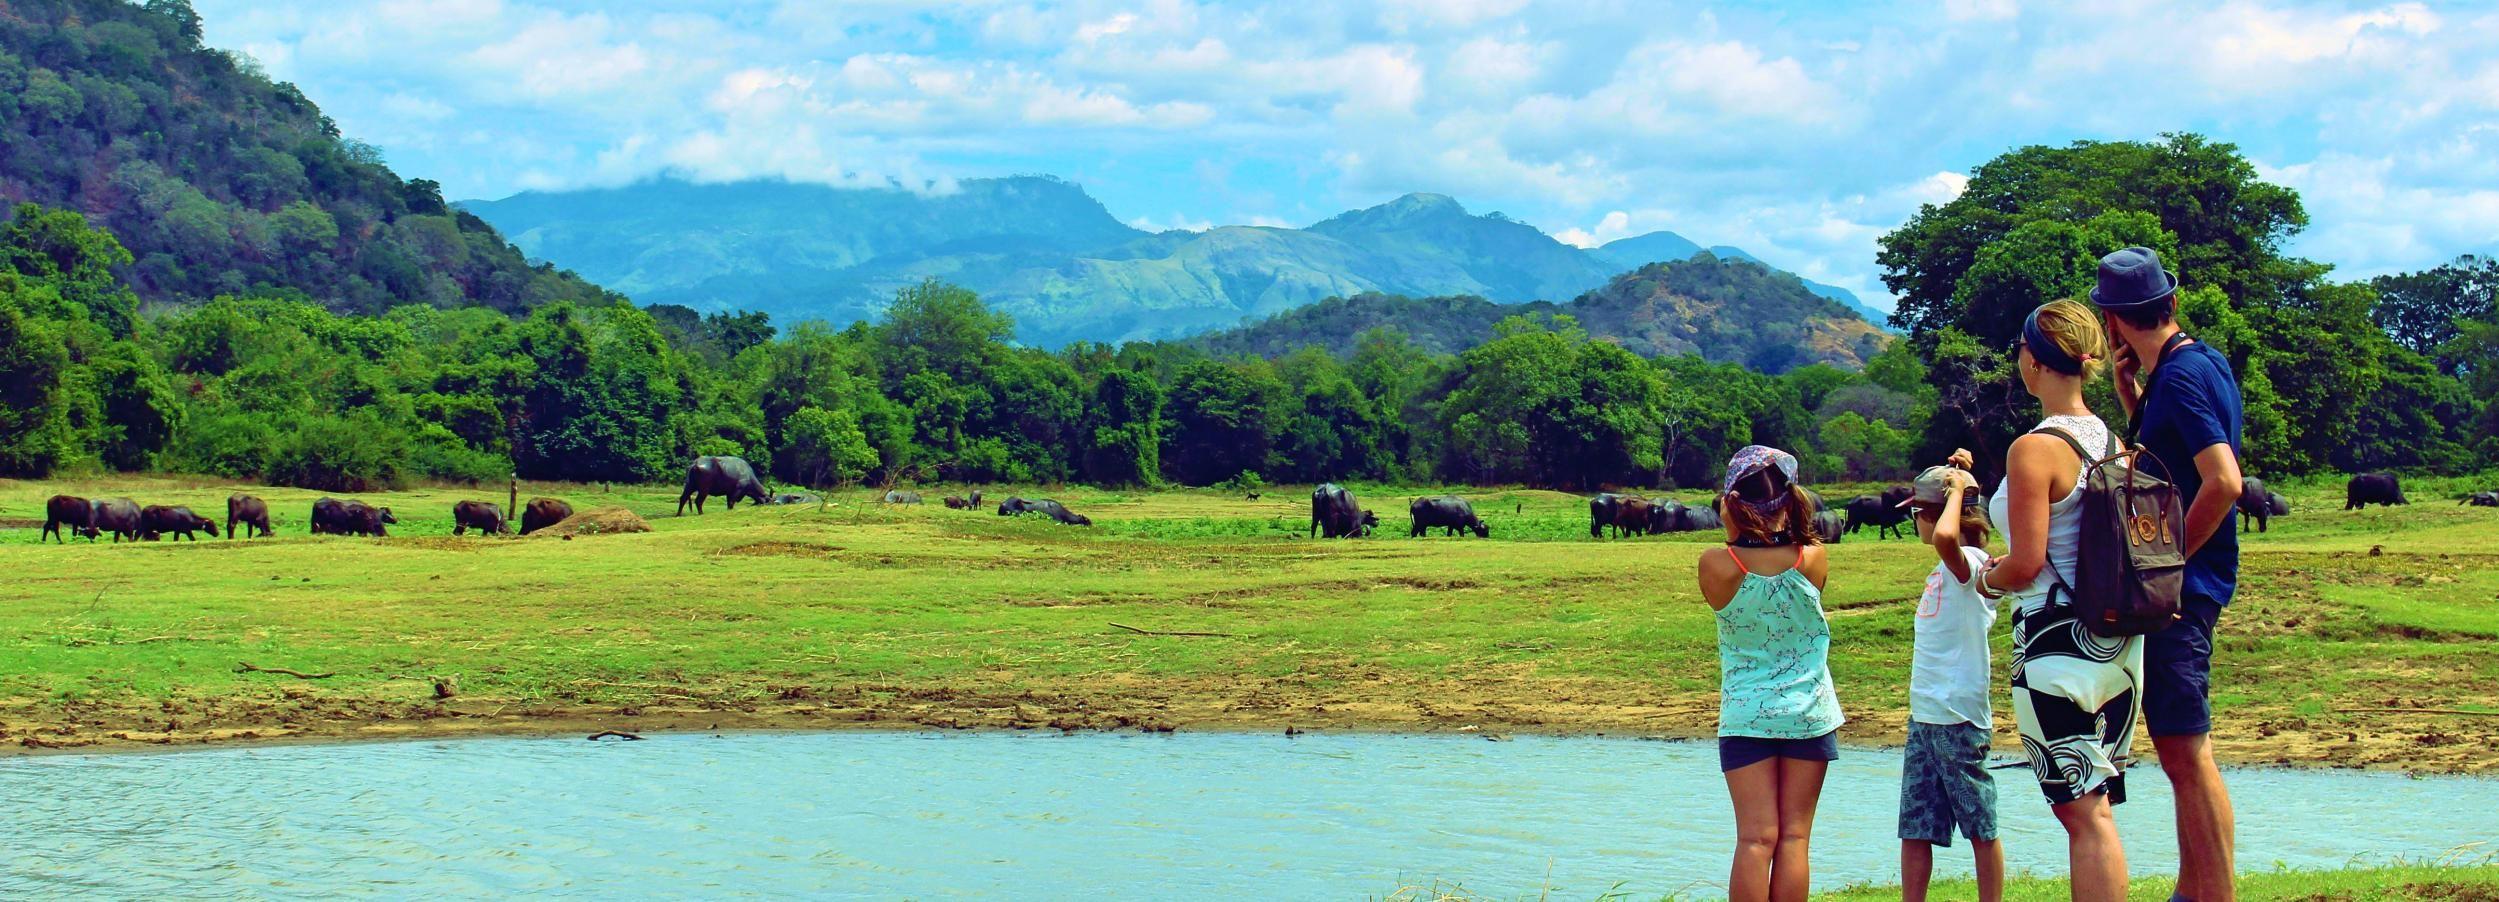 Sri Lanka: 5-Hour Guided Tour of Ella Village